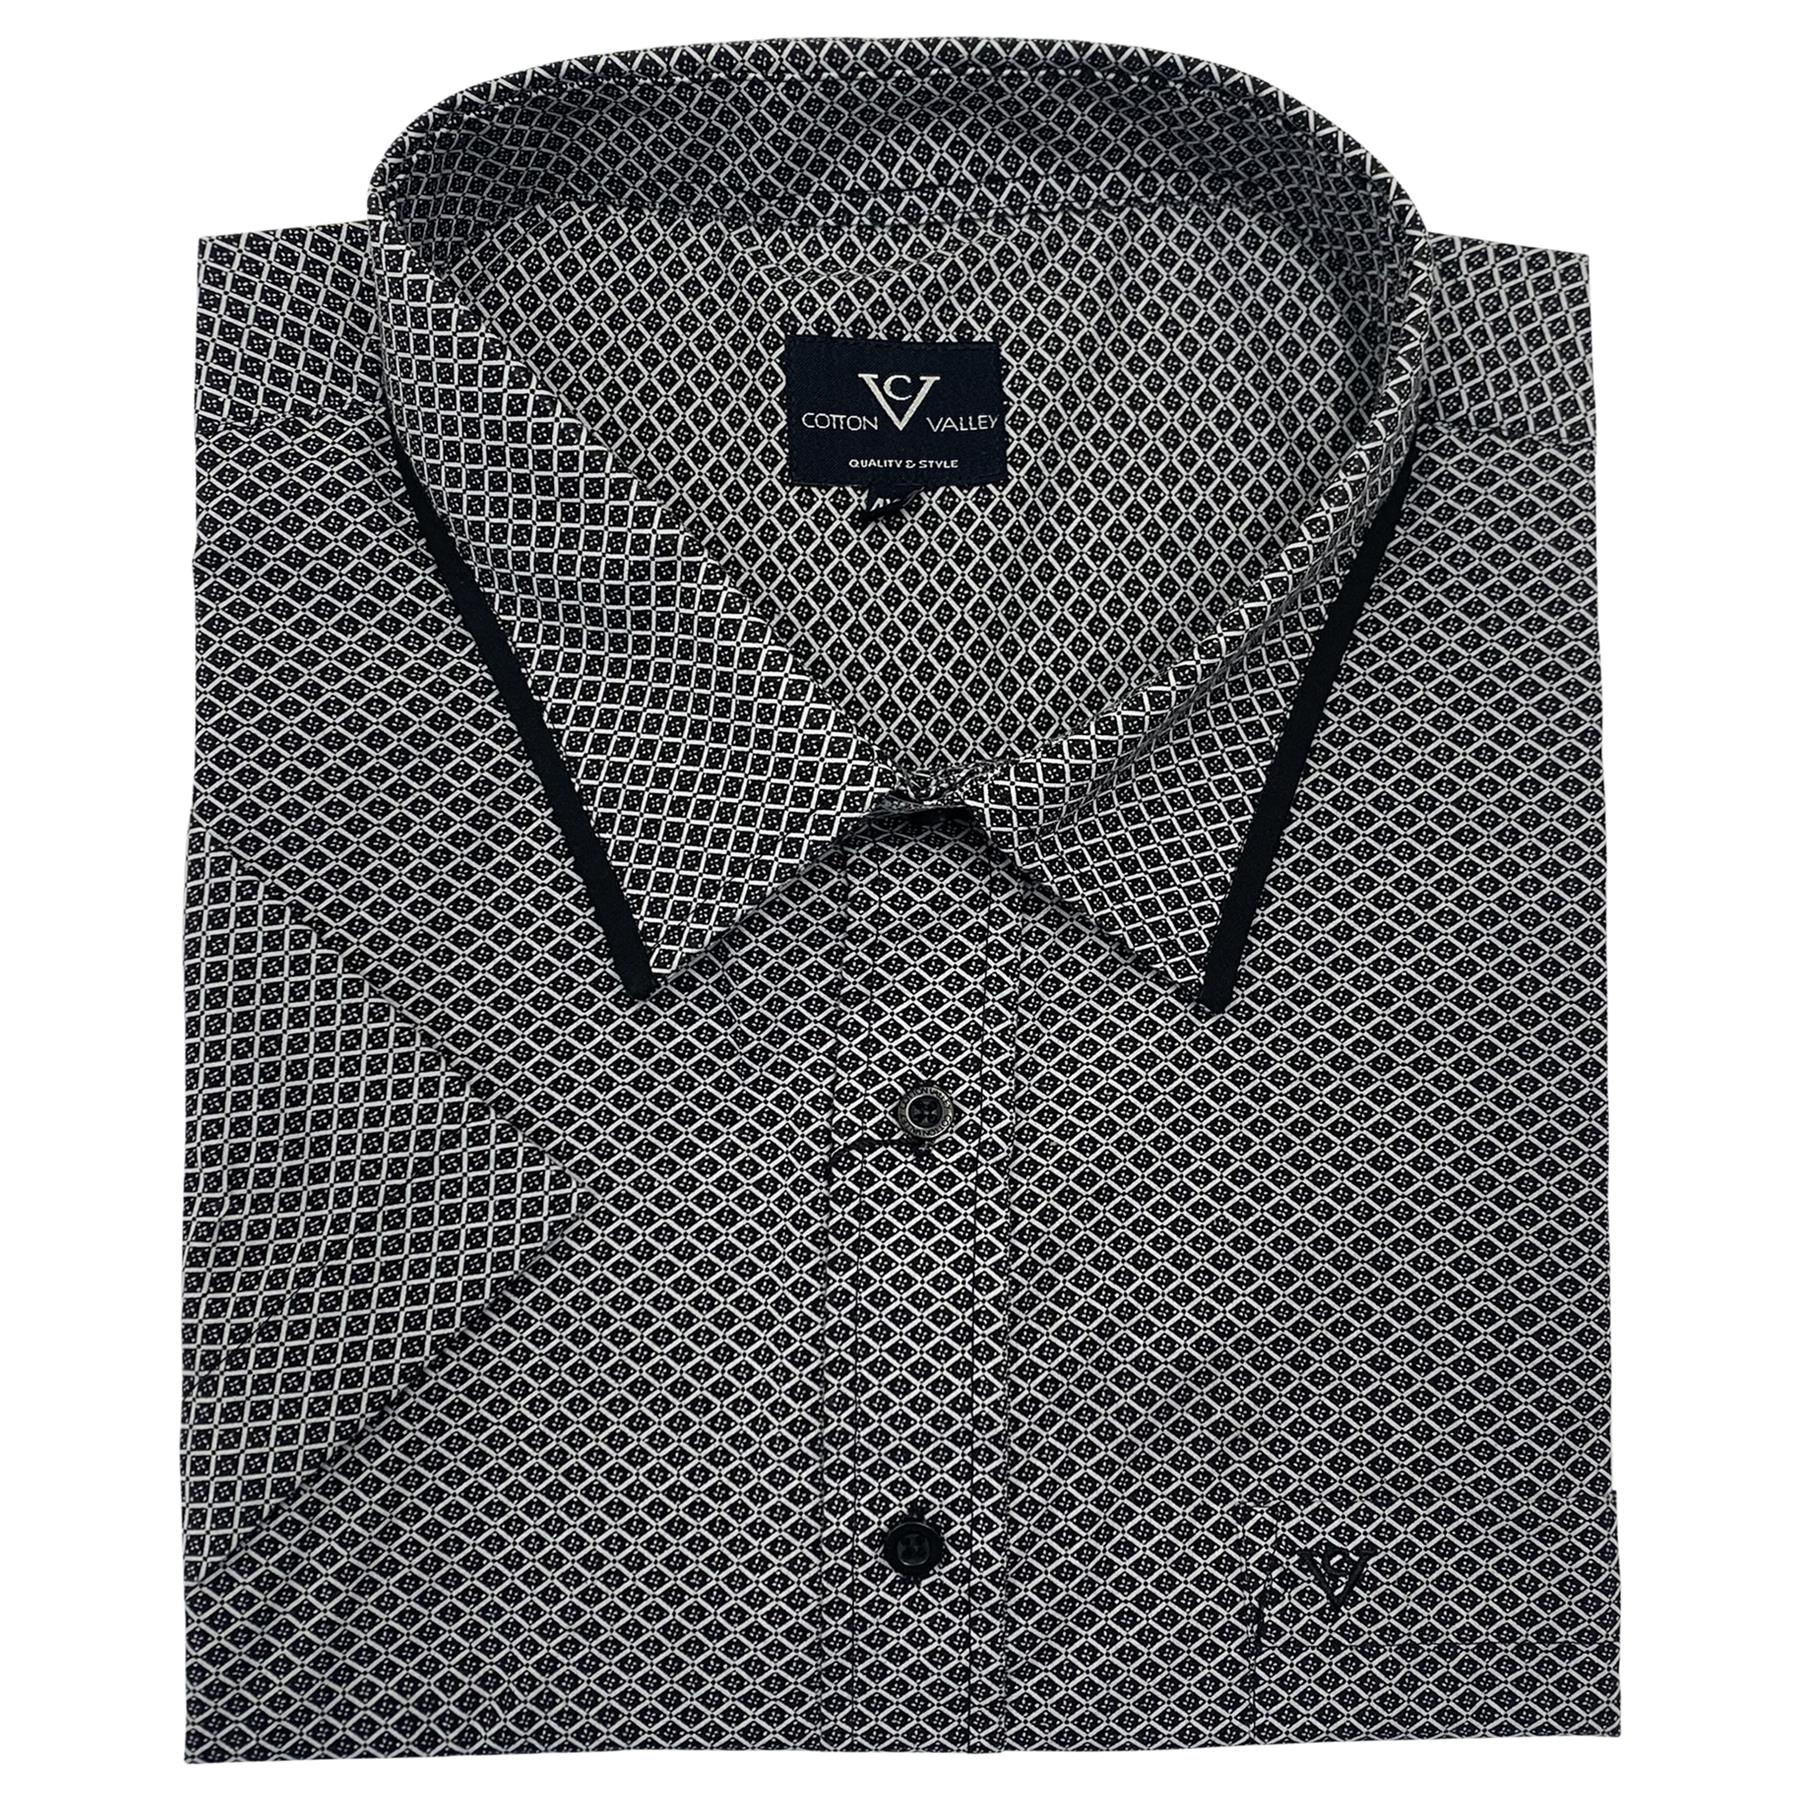 Mens Big Size Cotton Valley Check Casual Short Sleeve Shirt 2XL 3XL 4XL 5XL 6XL